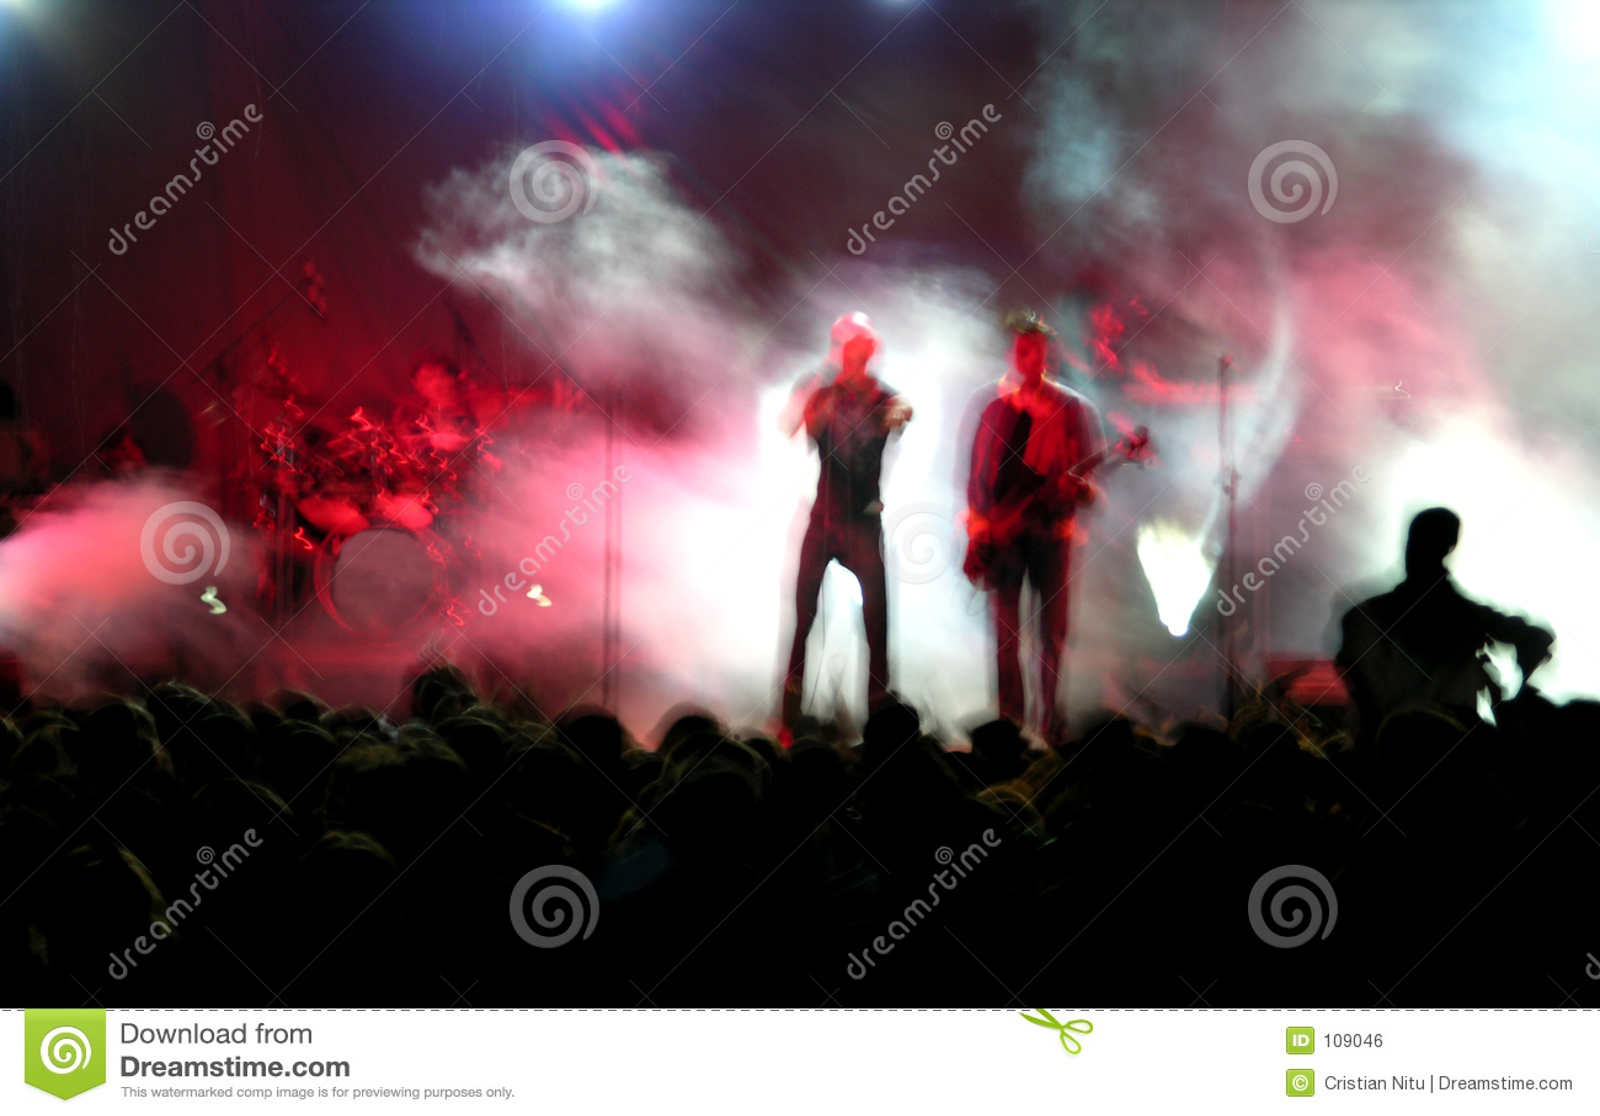 Blur concert rock